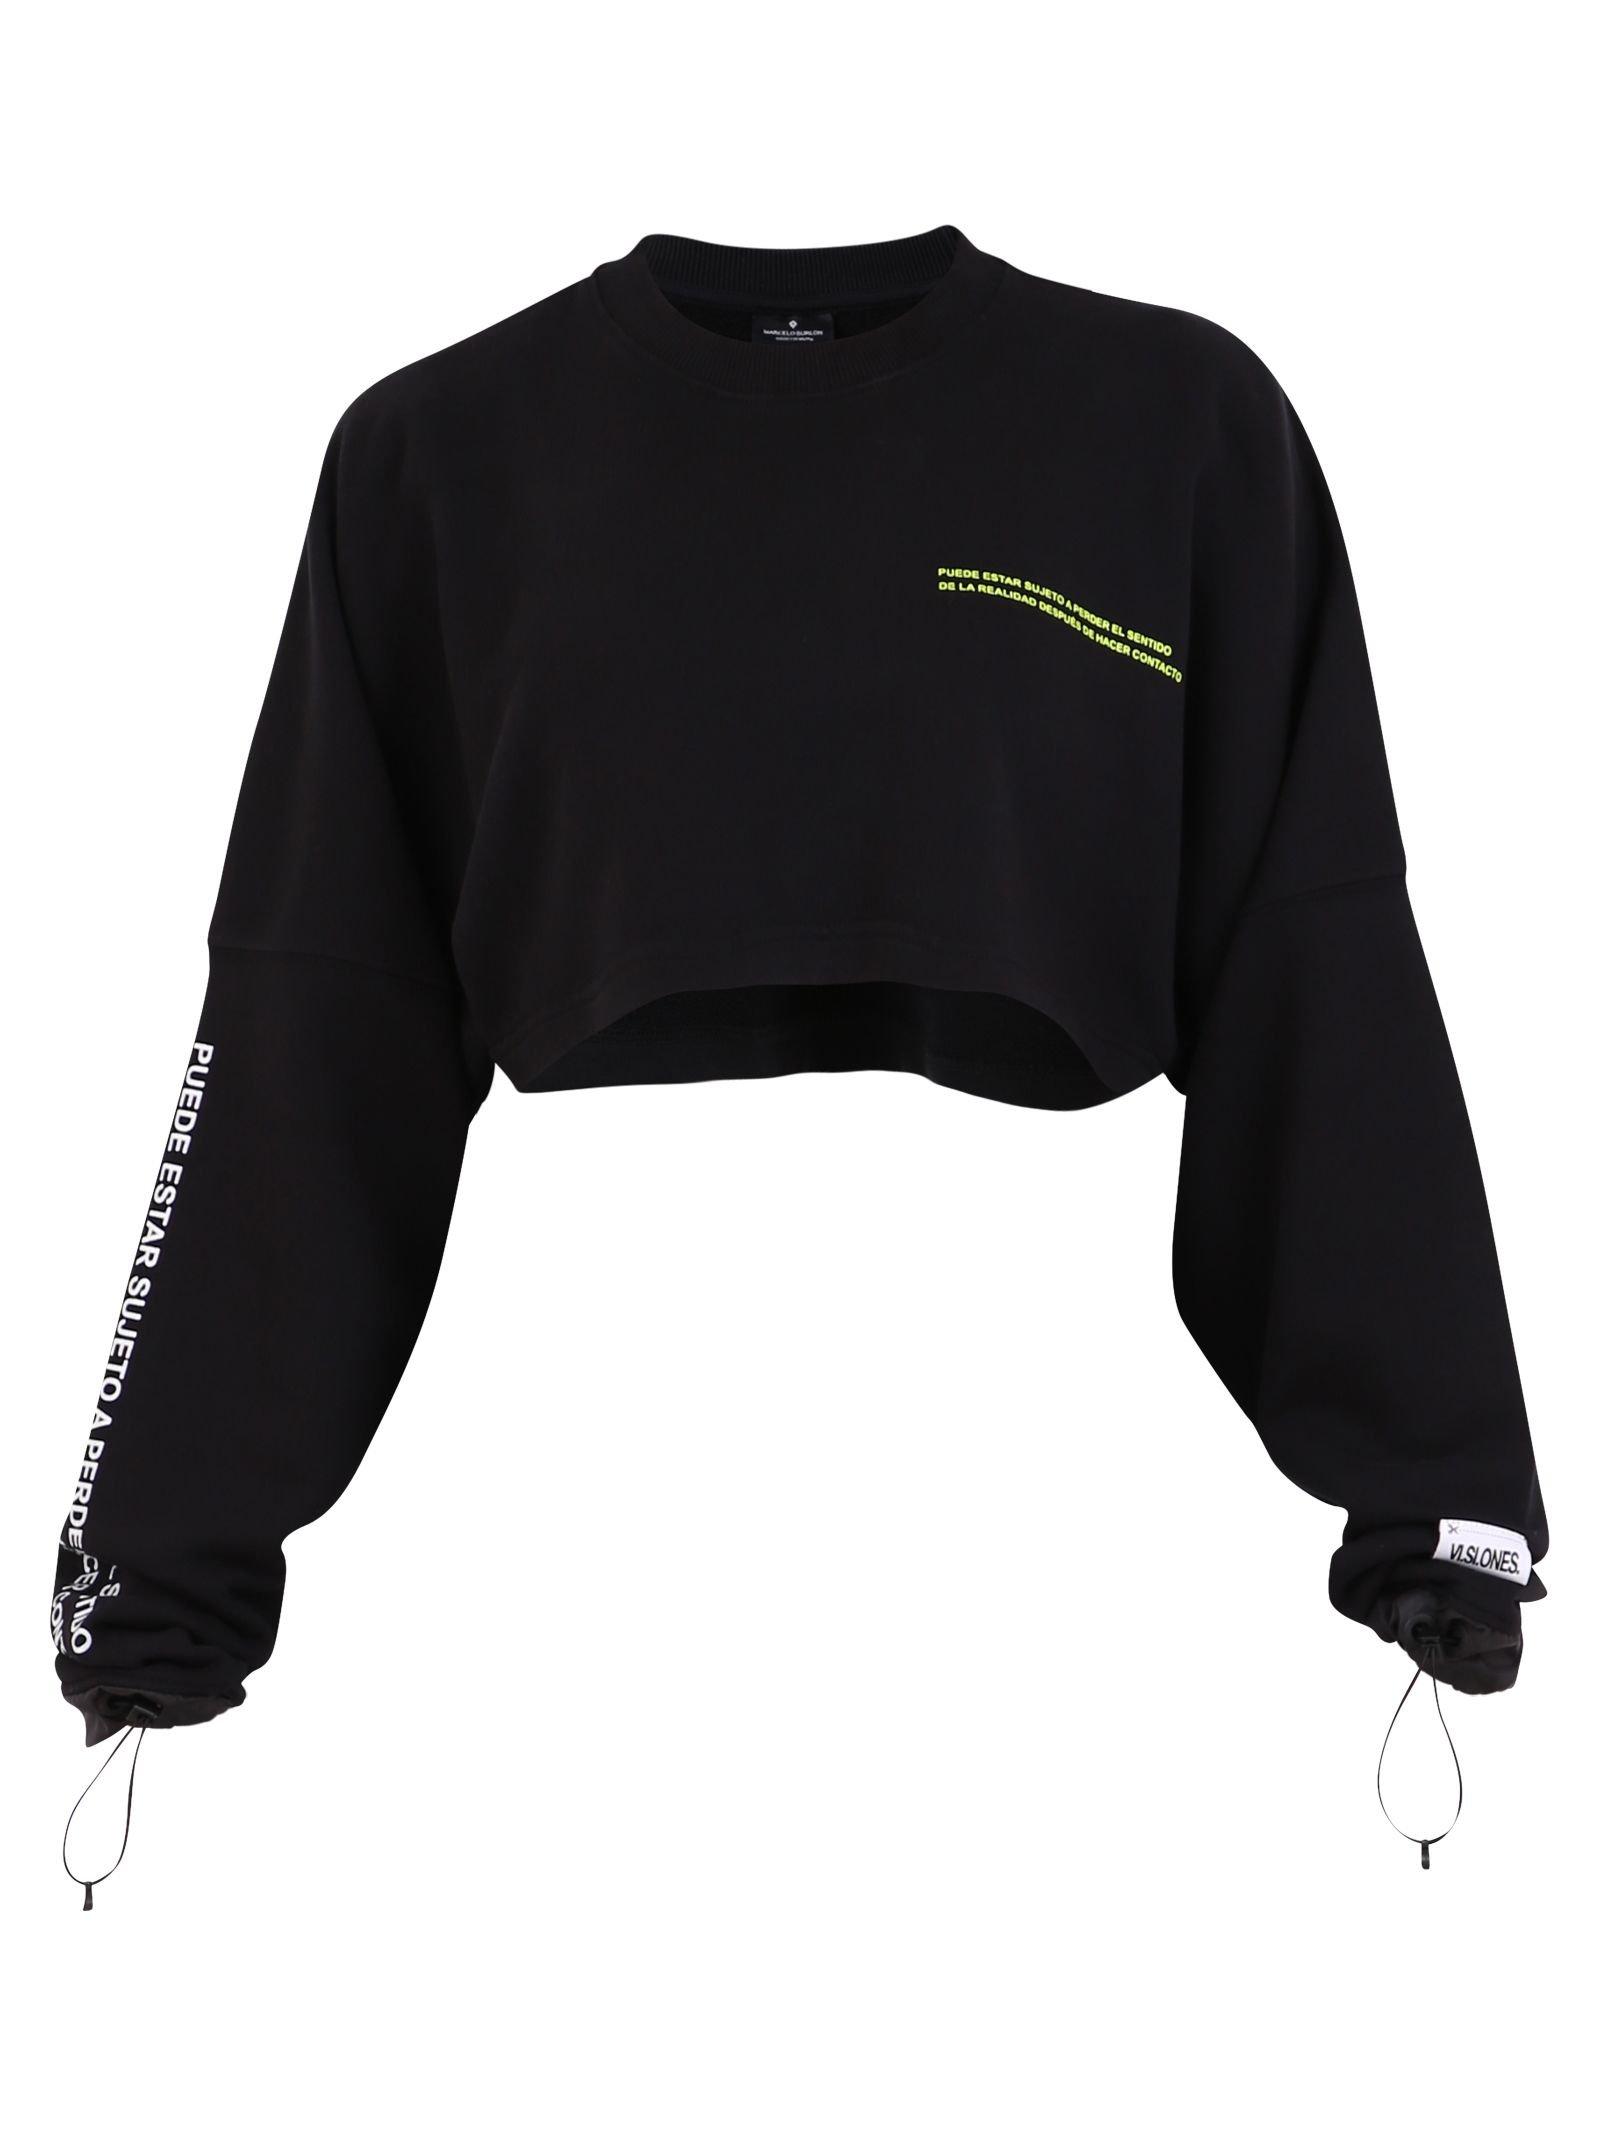 Marcelo Burlon Cropped Sweatshirt